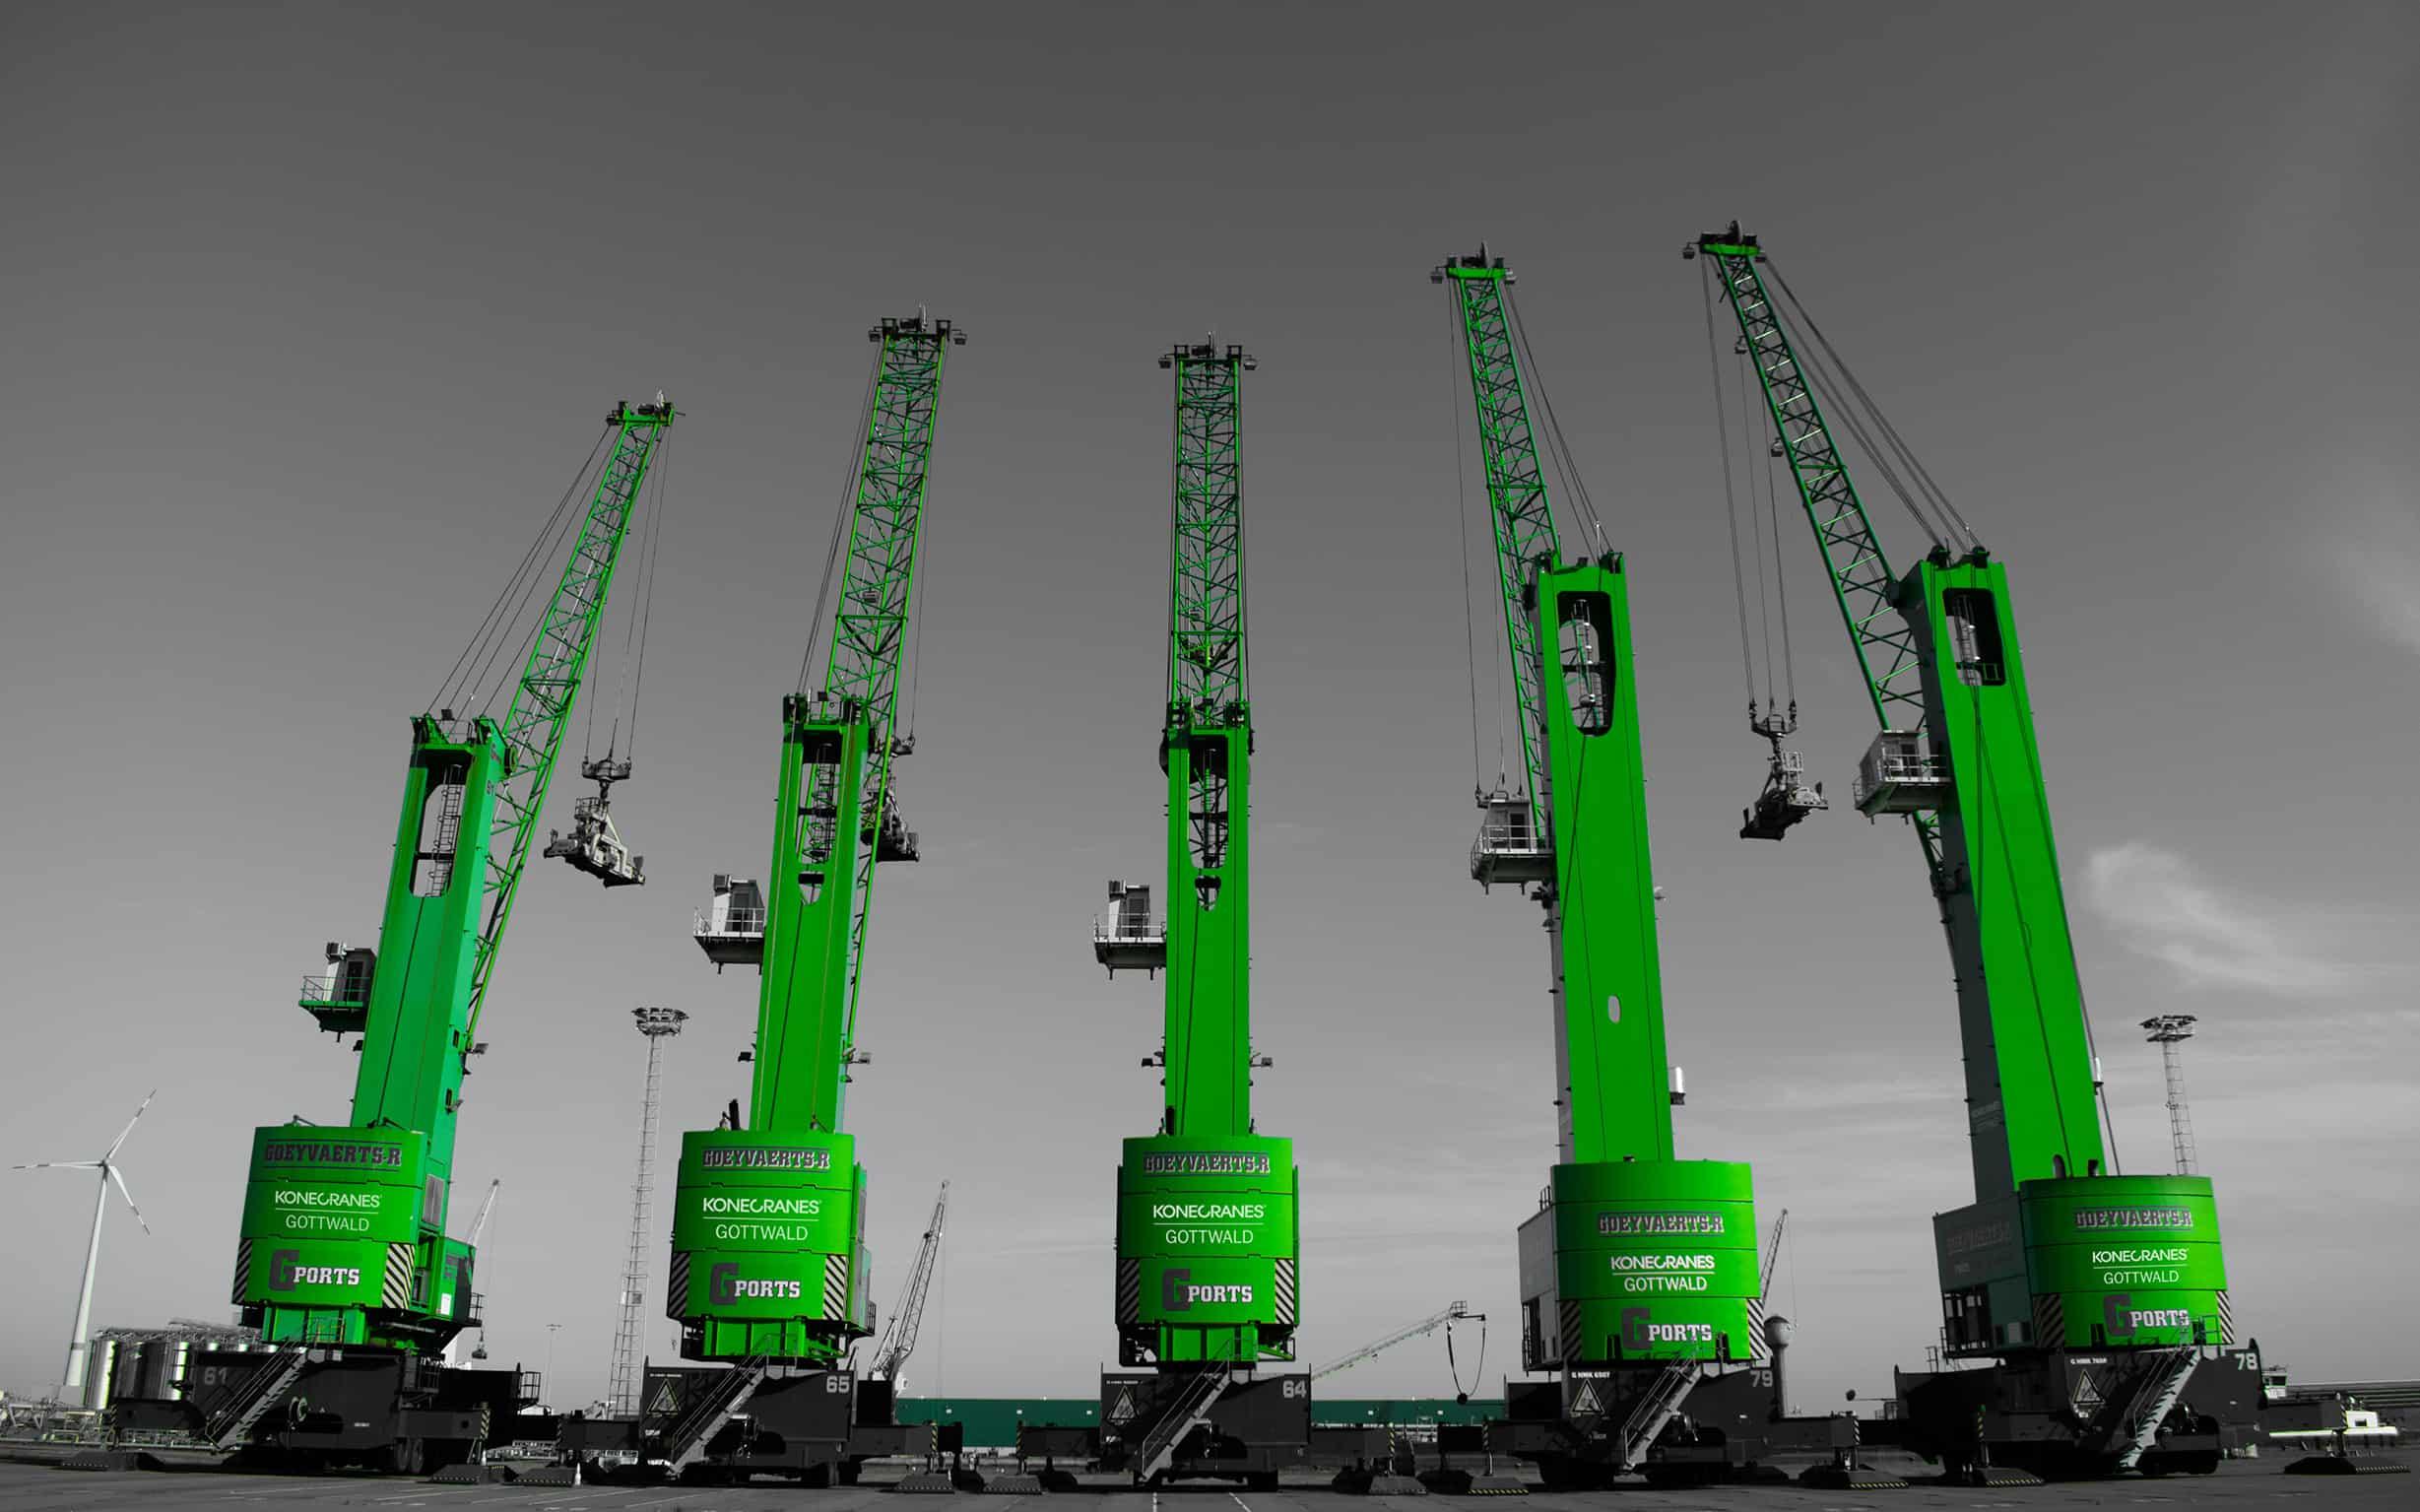 Goeyvaerts orders two more Konecranes Gottwald mobile harbour cranes